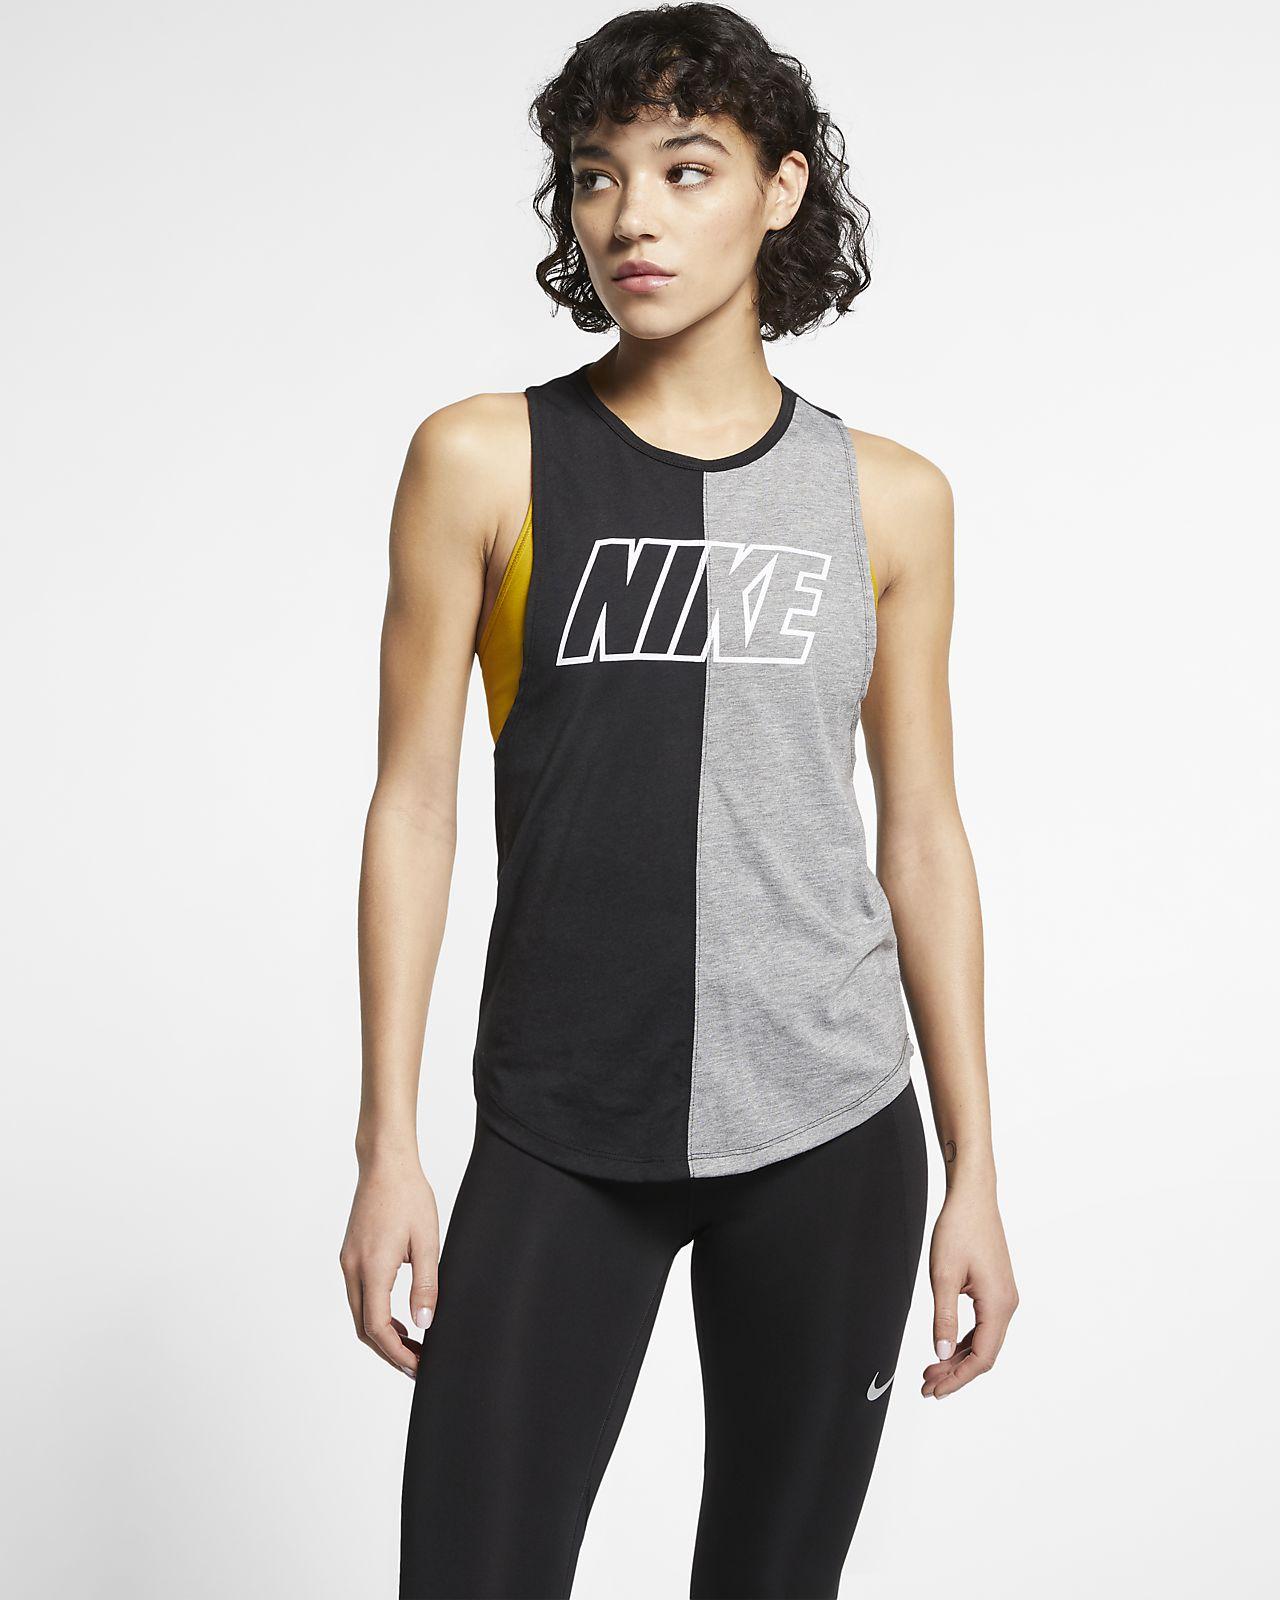 42f882970657ac Nike Miler Women s Running Tank. Nike.com